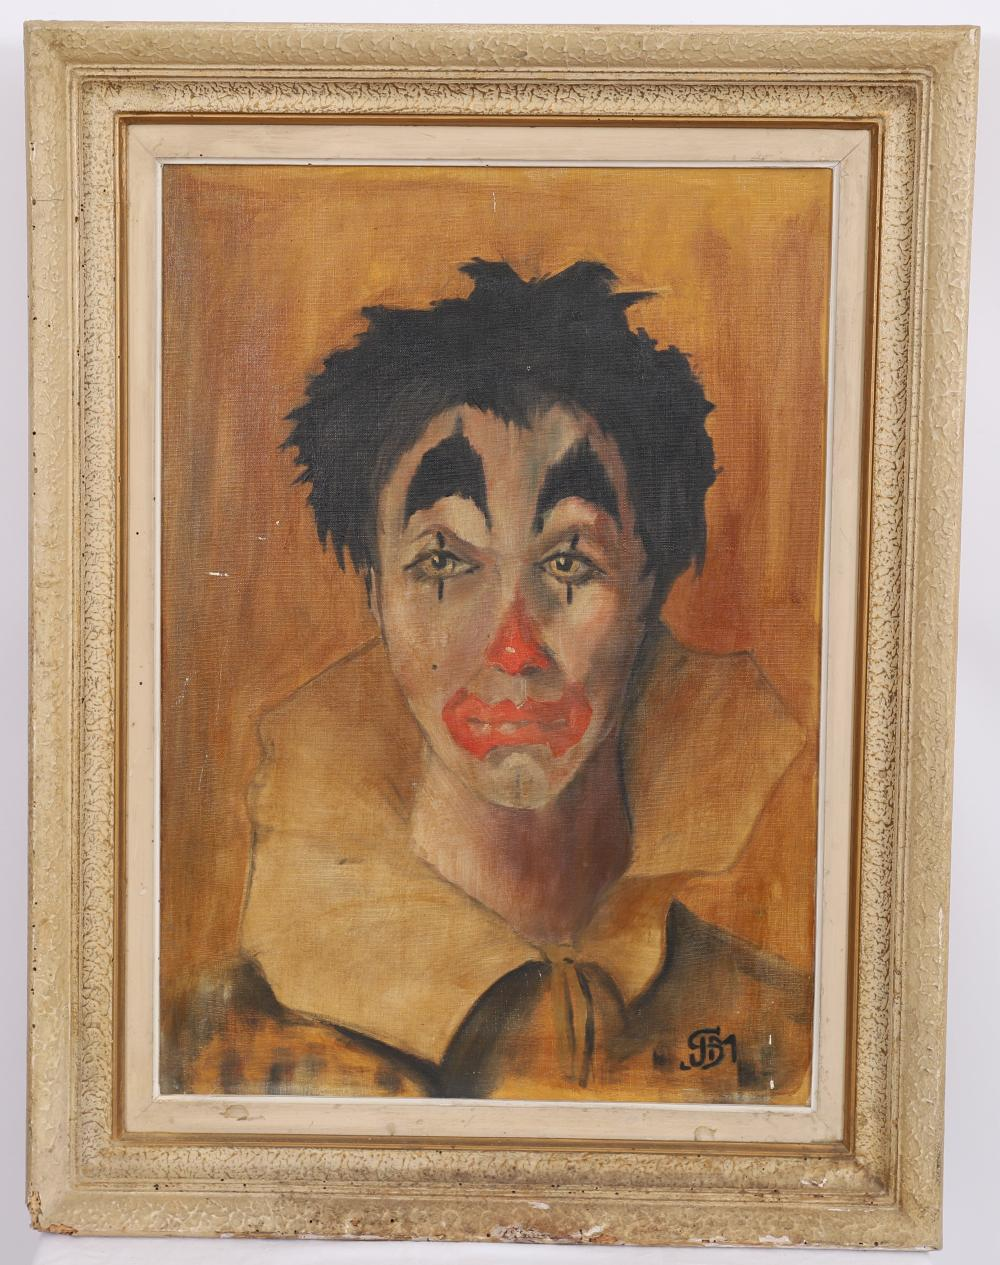 Sold Price Tableau Clown Triste Monogramme J S M Huile Surtoile Monogrammee Enc Invalid Date Cest